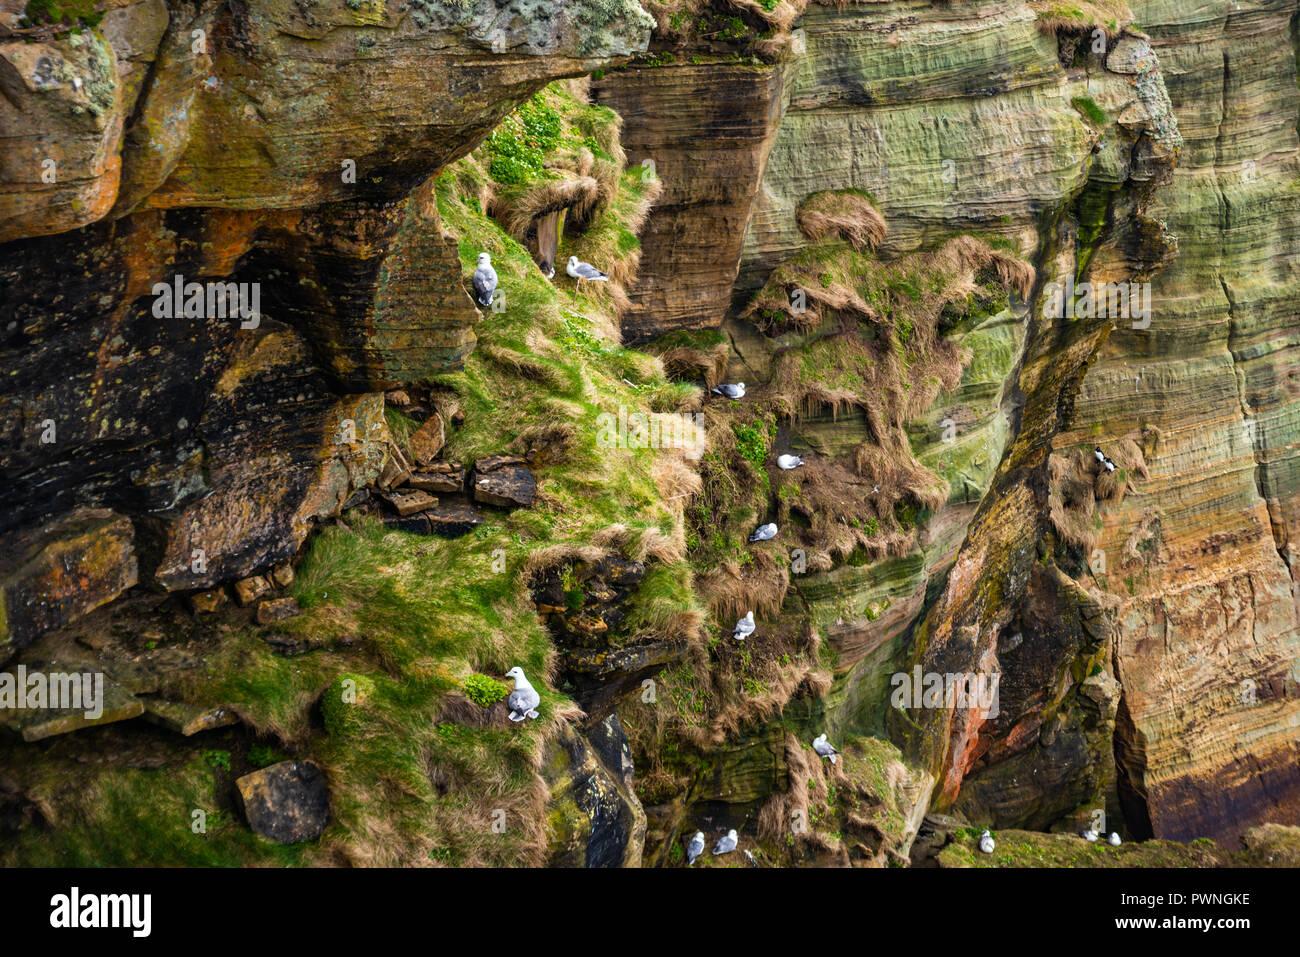 Seabirds nesting at, Lighthouse, Dunnet Head,, north coast, Scotland, Uk - Stock Image